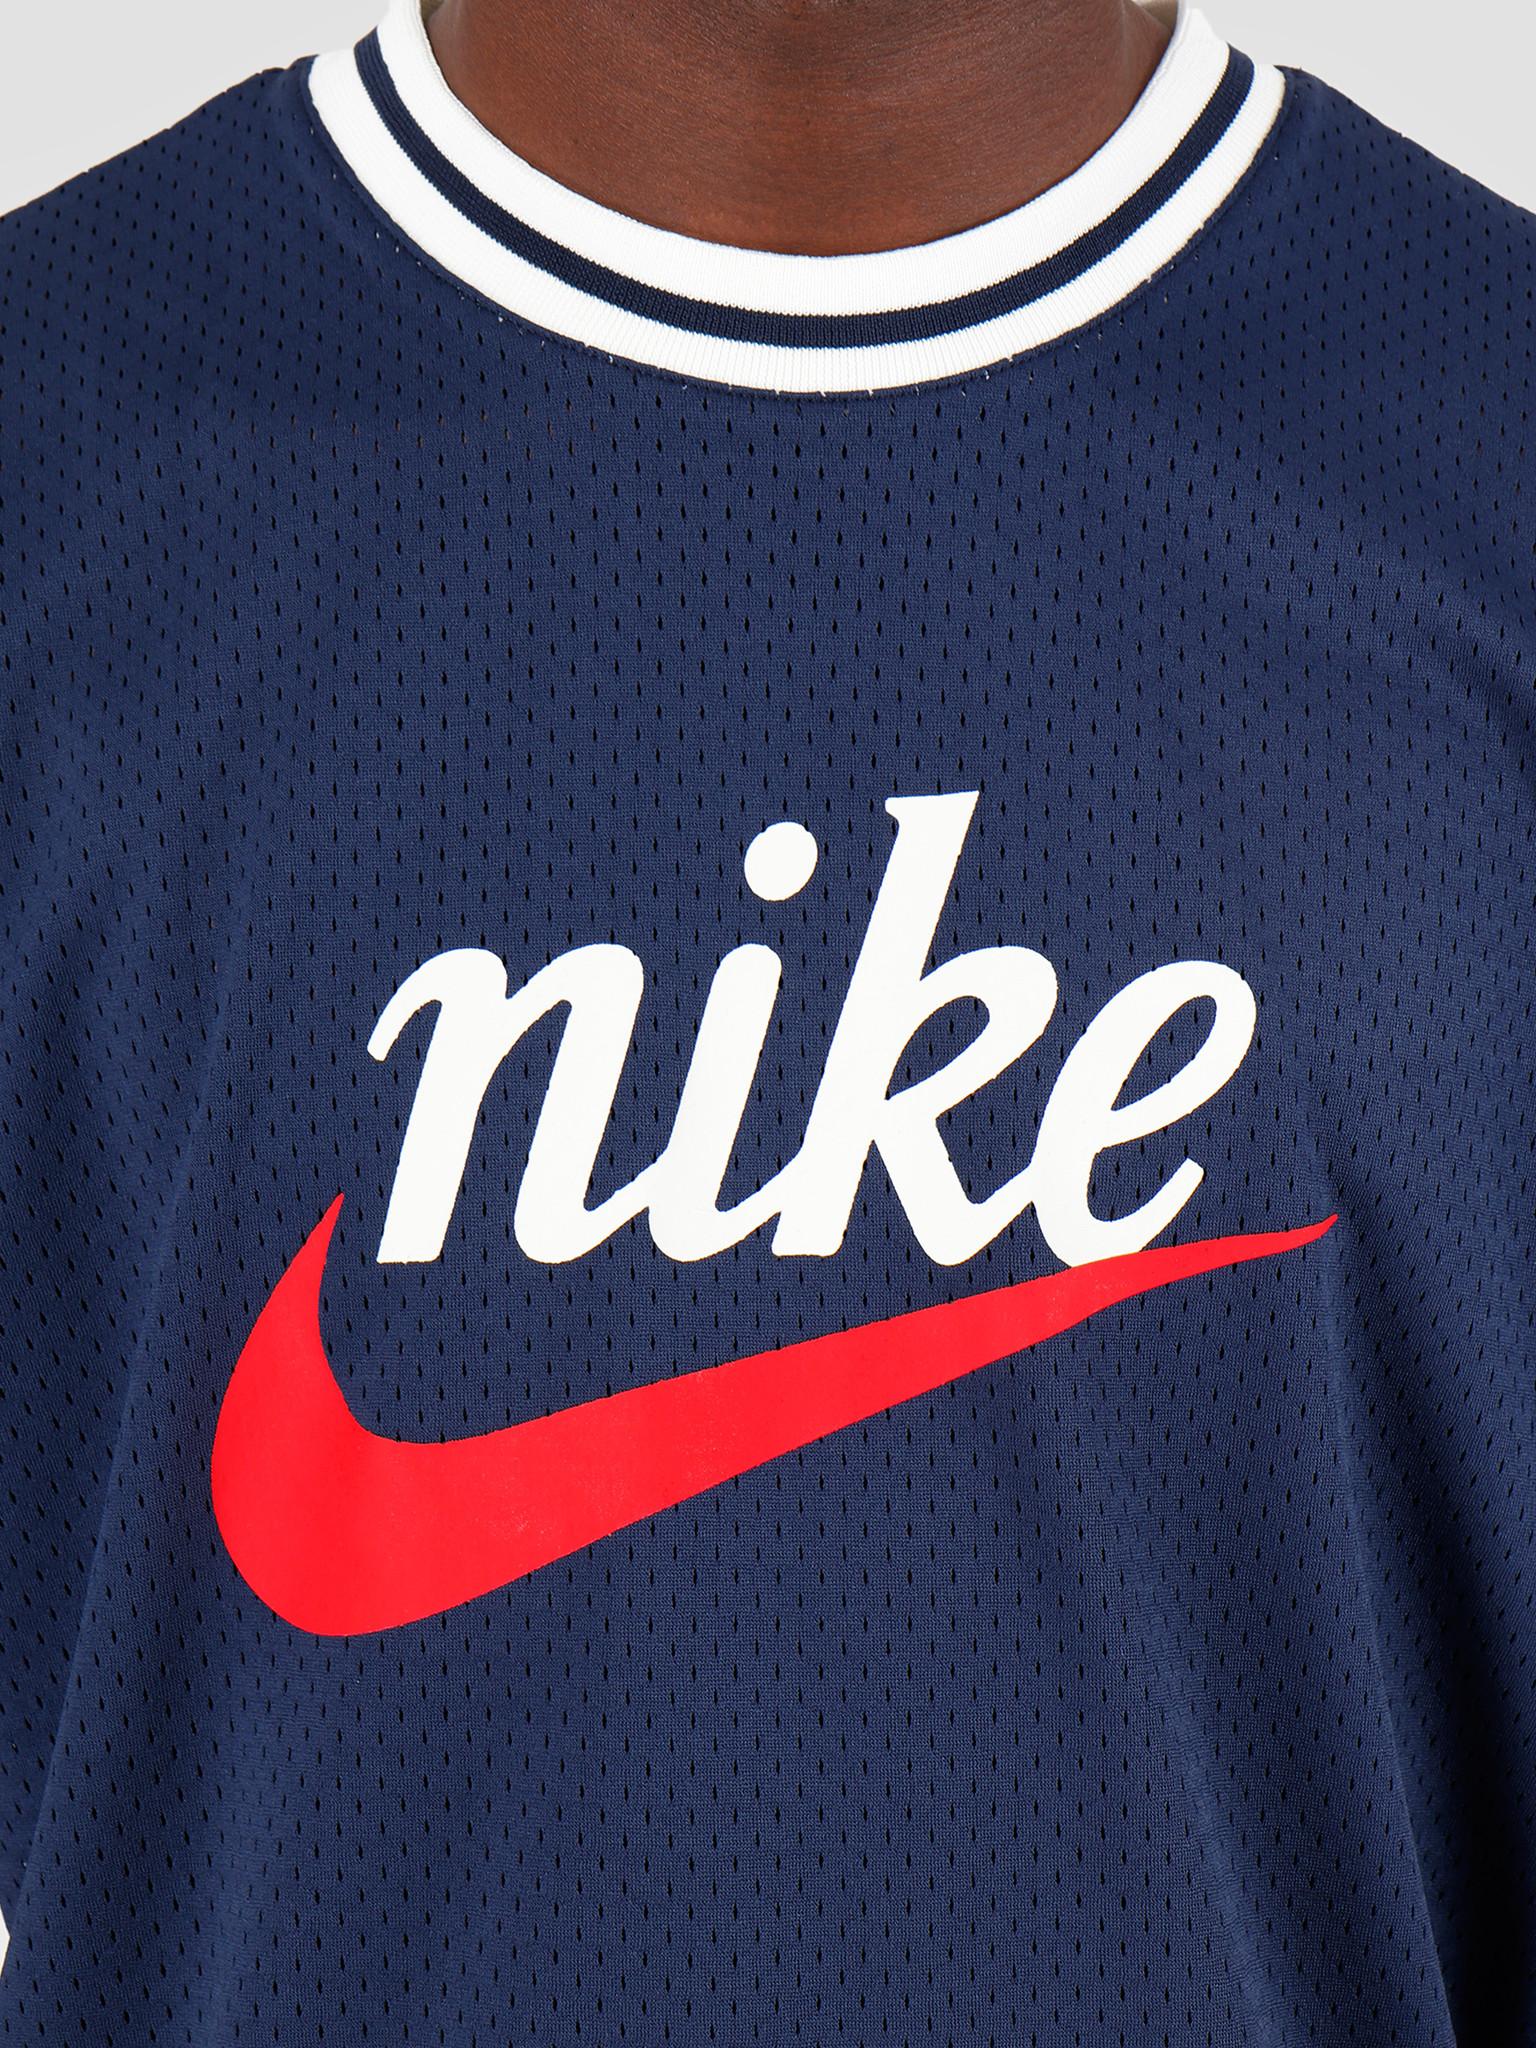 Nike Nike NSW He Top Esh Gx Idnight Navy BV2931-410